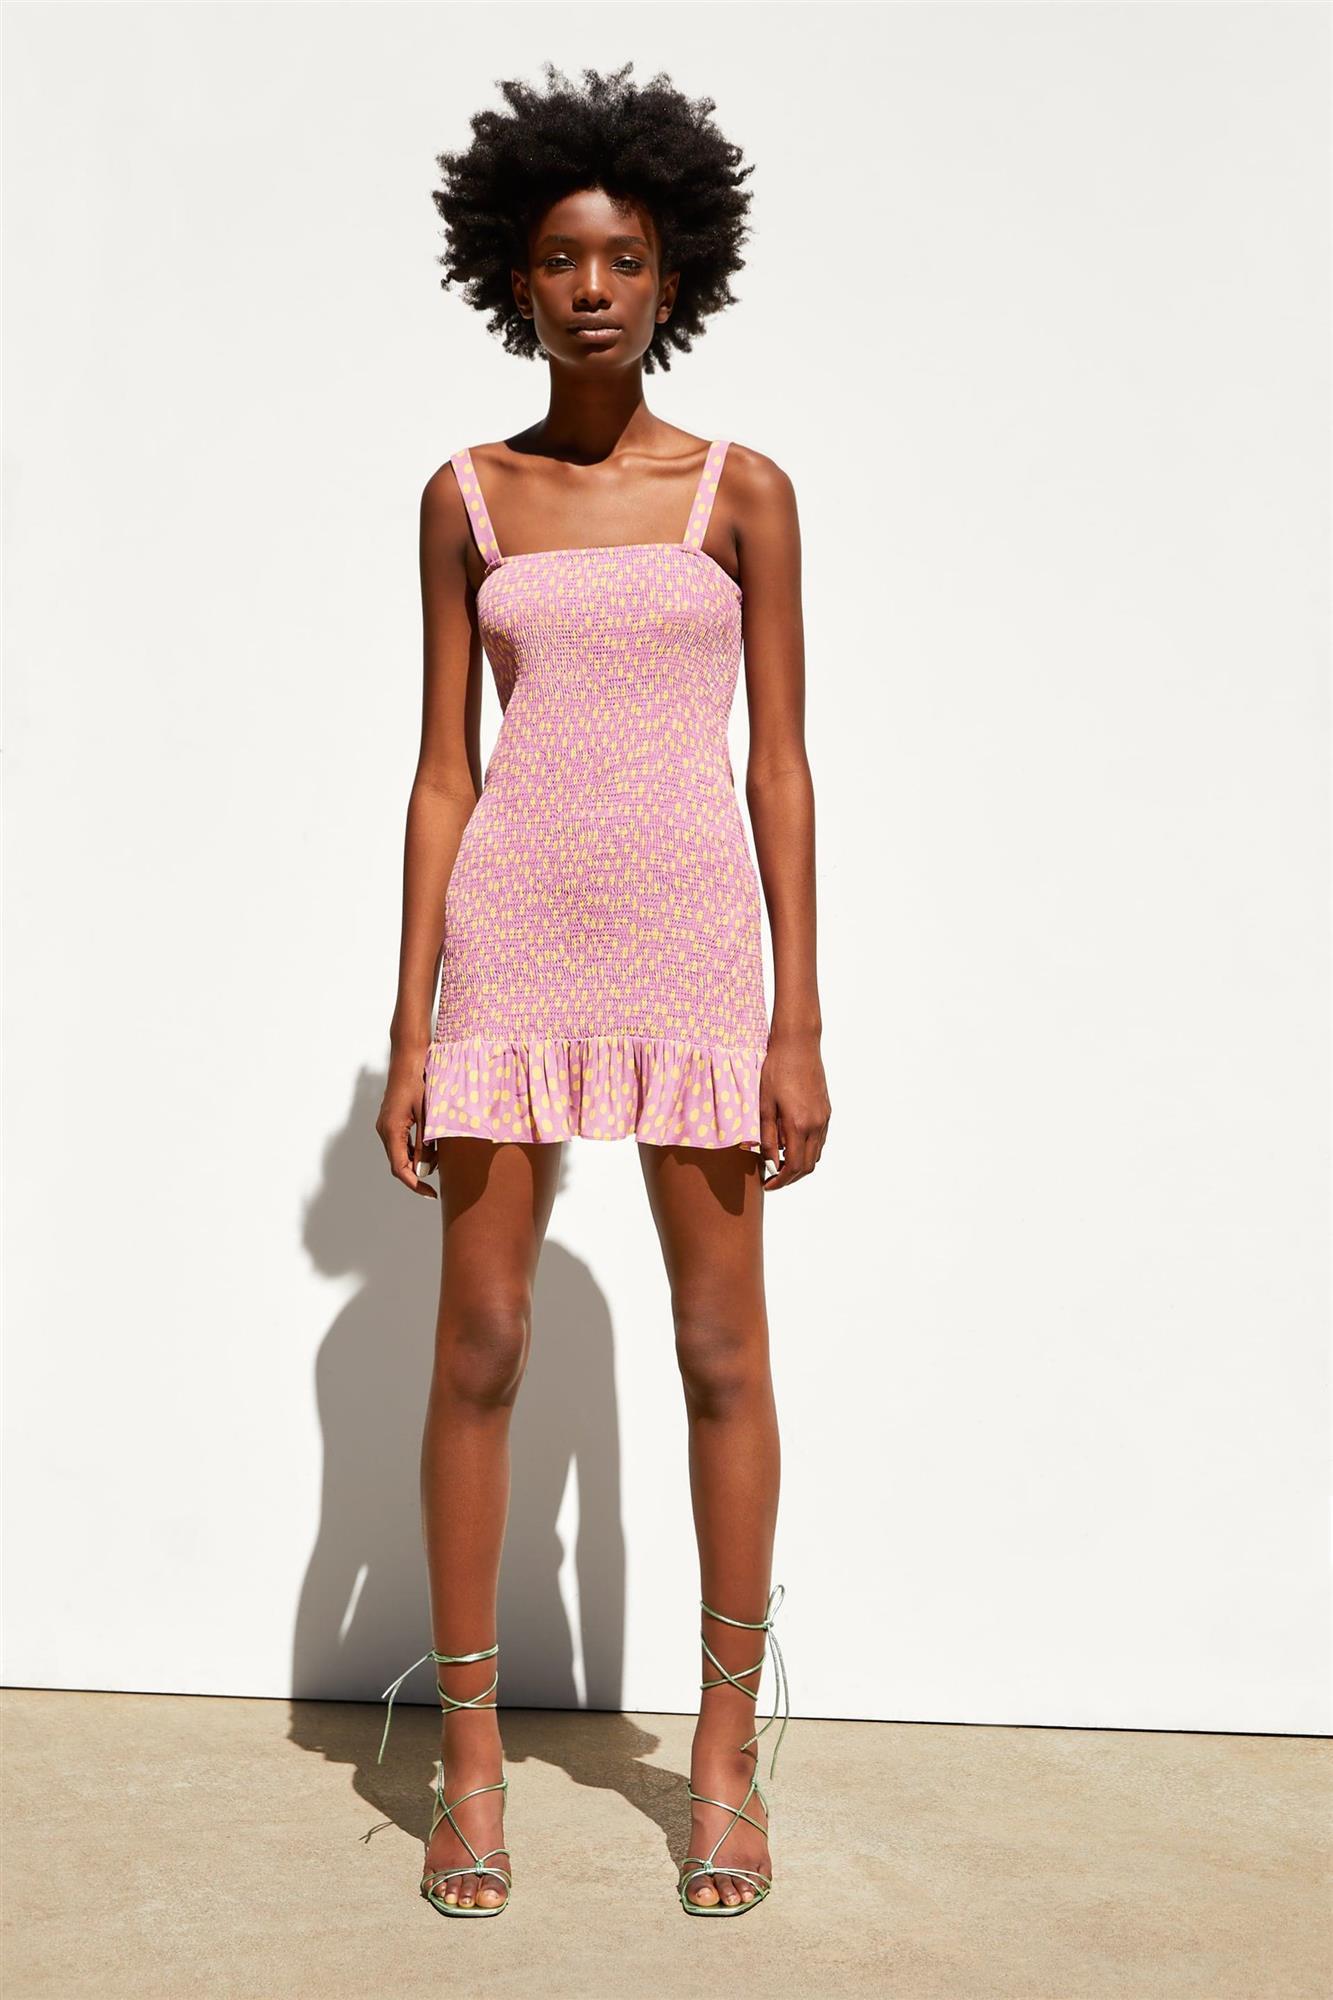 df93b2b07 Rebajas de moda de verano 2019 en Zara, Pull&Bear, Bershka ...